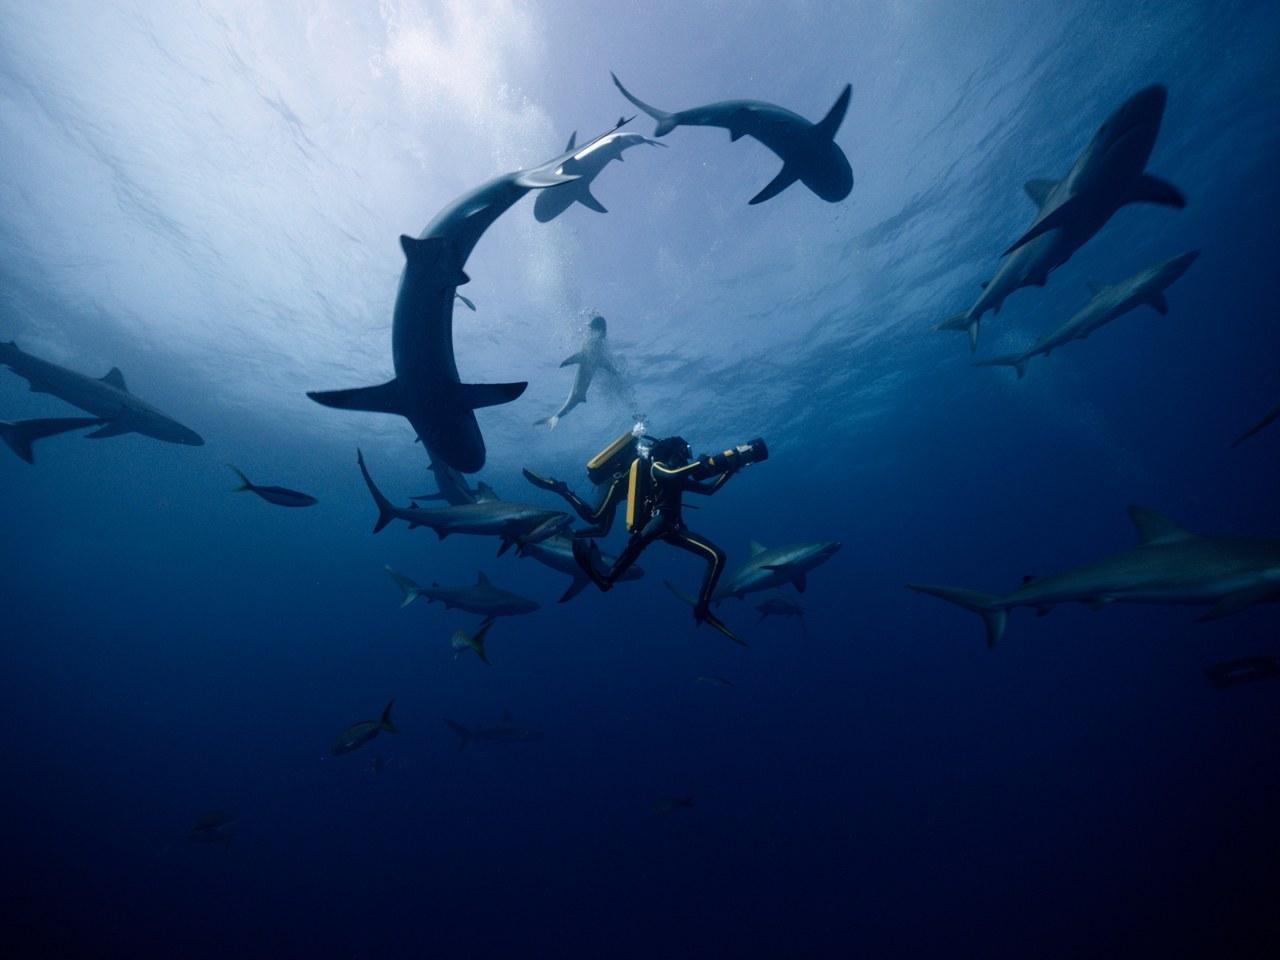 Jacques - Entdecker der Ozeane - Bild 4